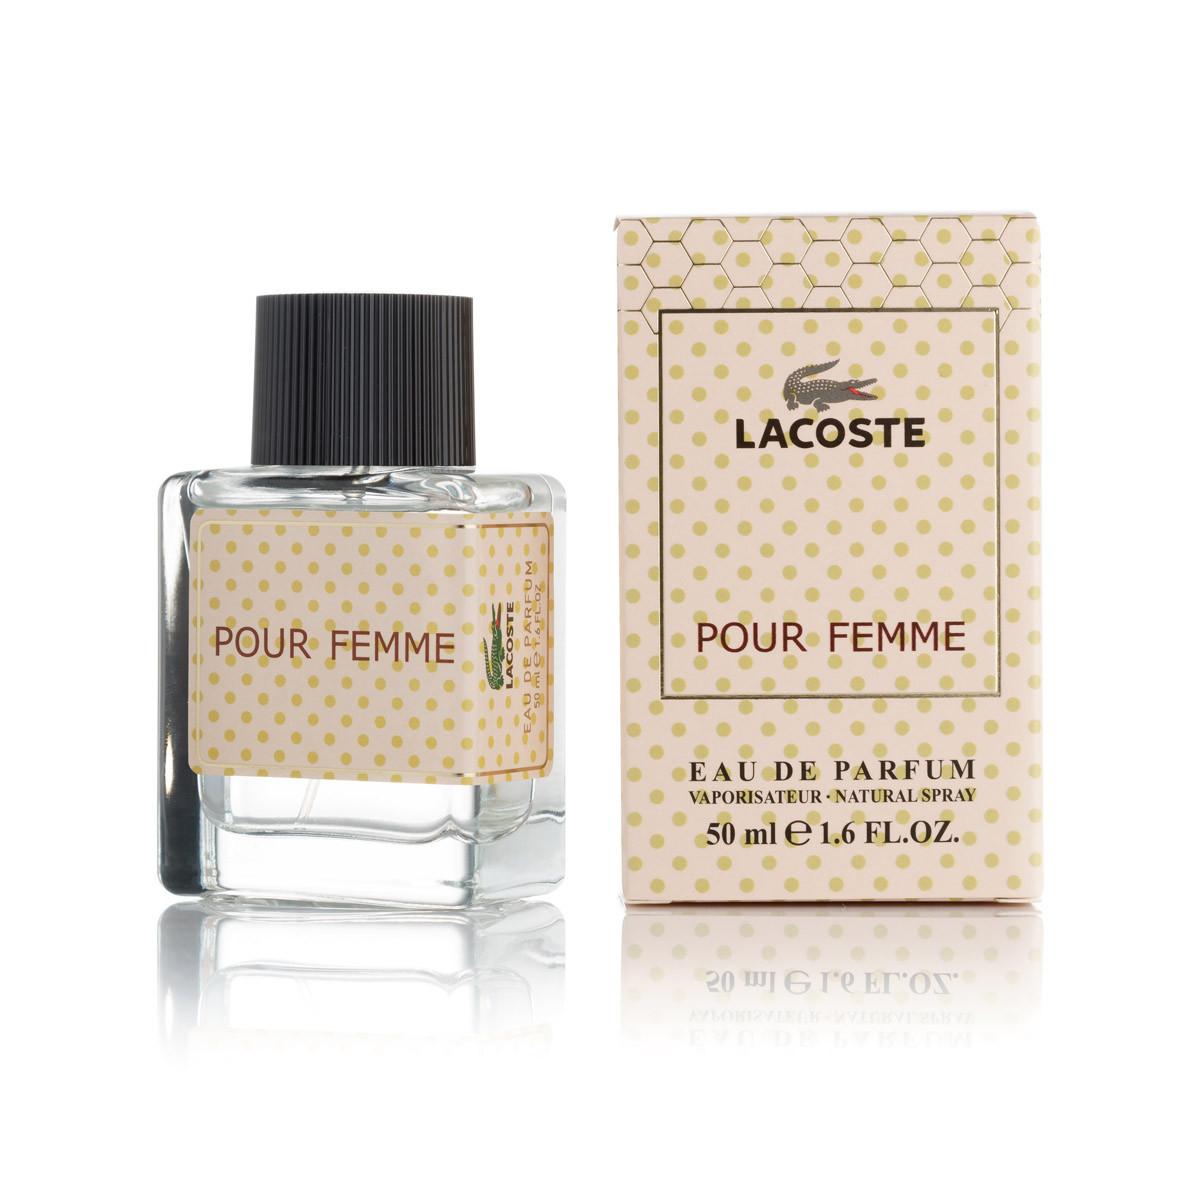 Жіночі парфуми Lacoste Pour Femme-60 мл